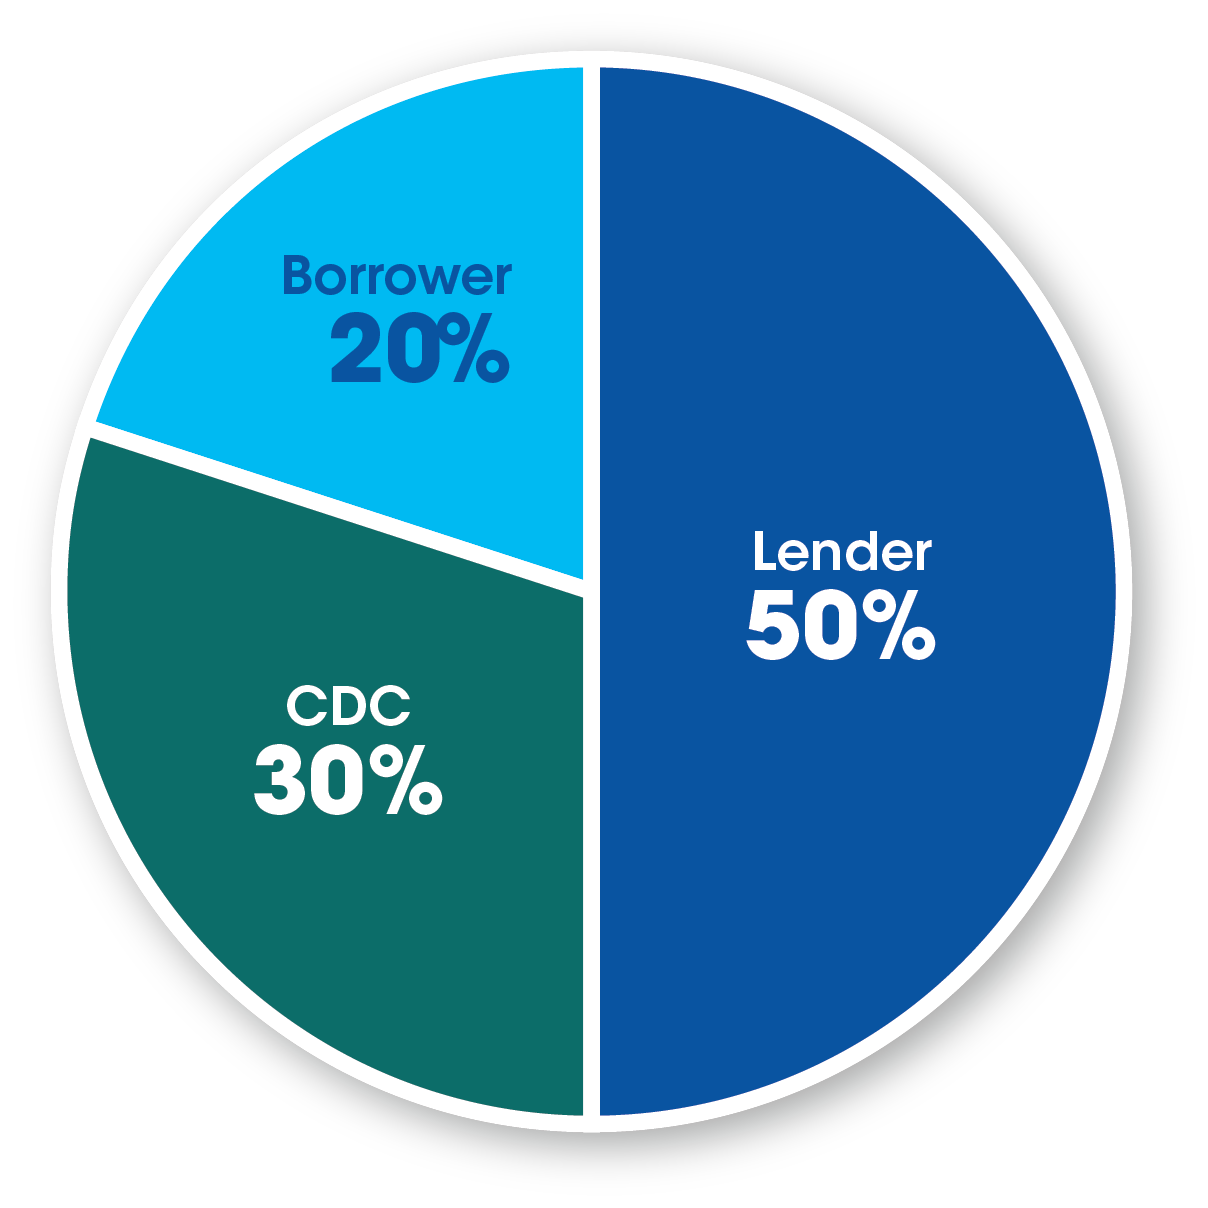 Lender 50%, CDC 30%, Borrower 20%